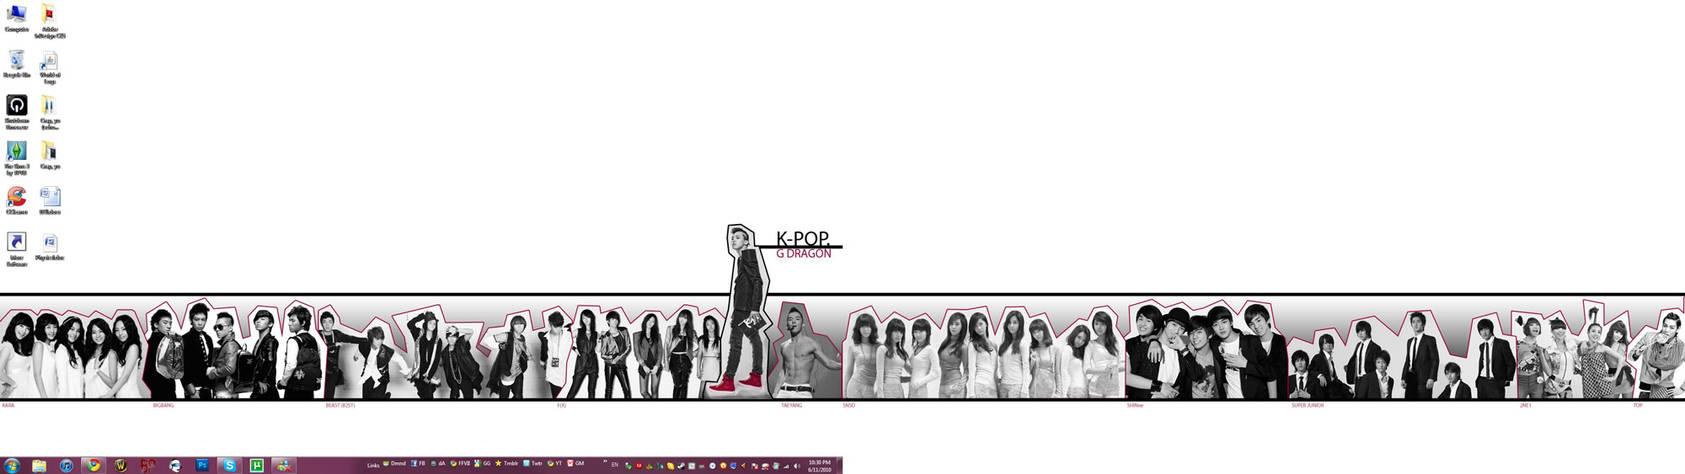 Desktop Screenie - 06.11.10